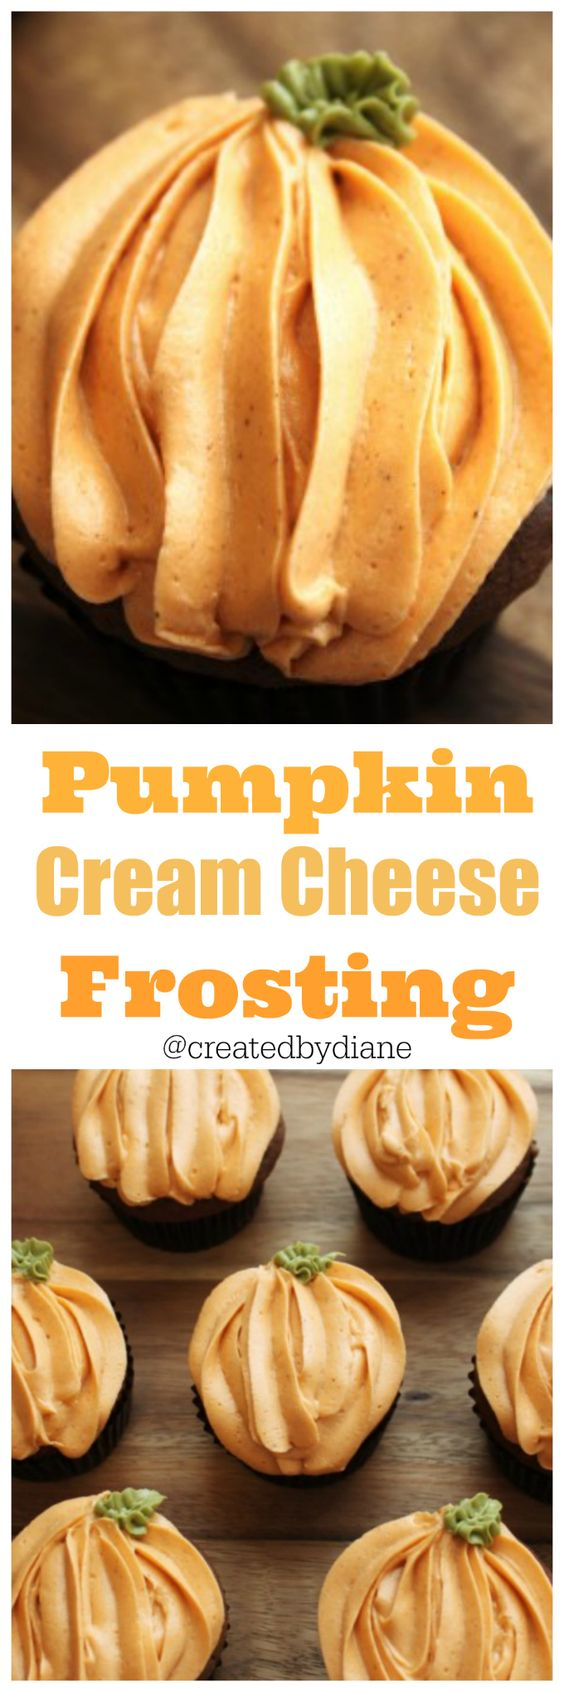 Pumpkin Cupcakes with Pumpkin Cream Cheese Frosting | Pumpkin Cream ...